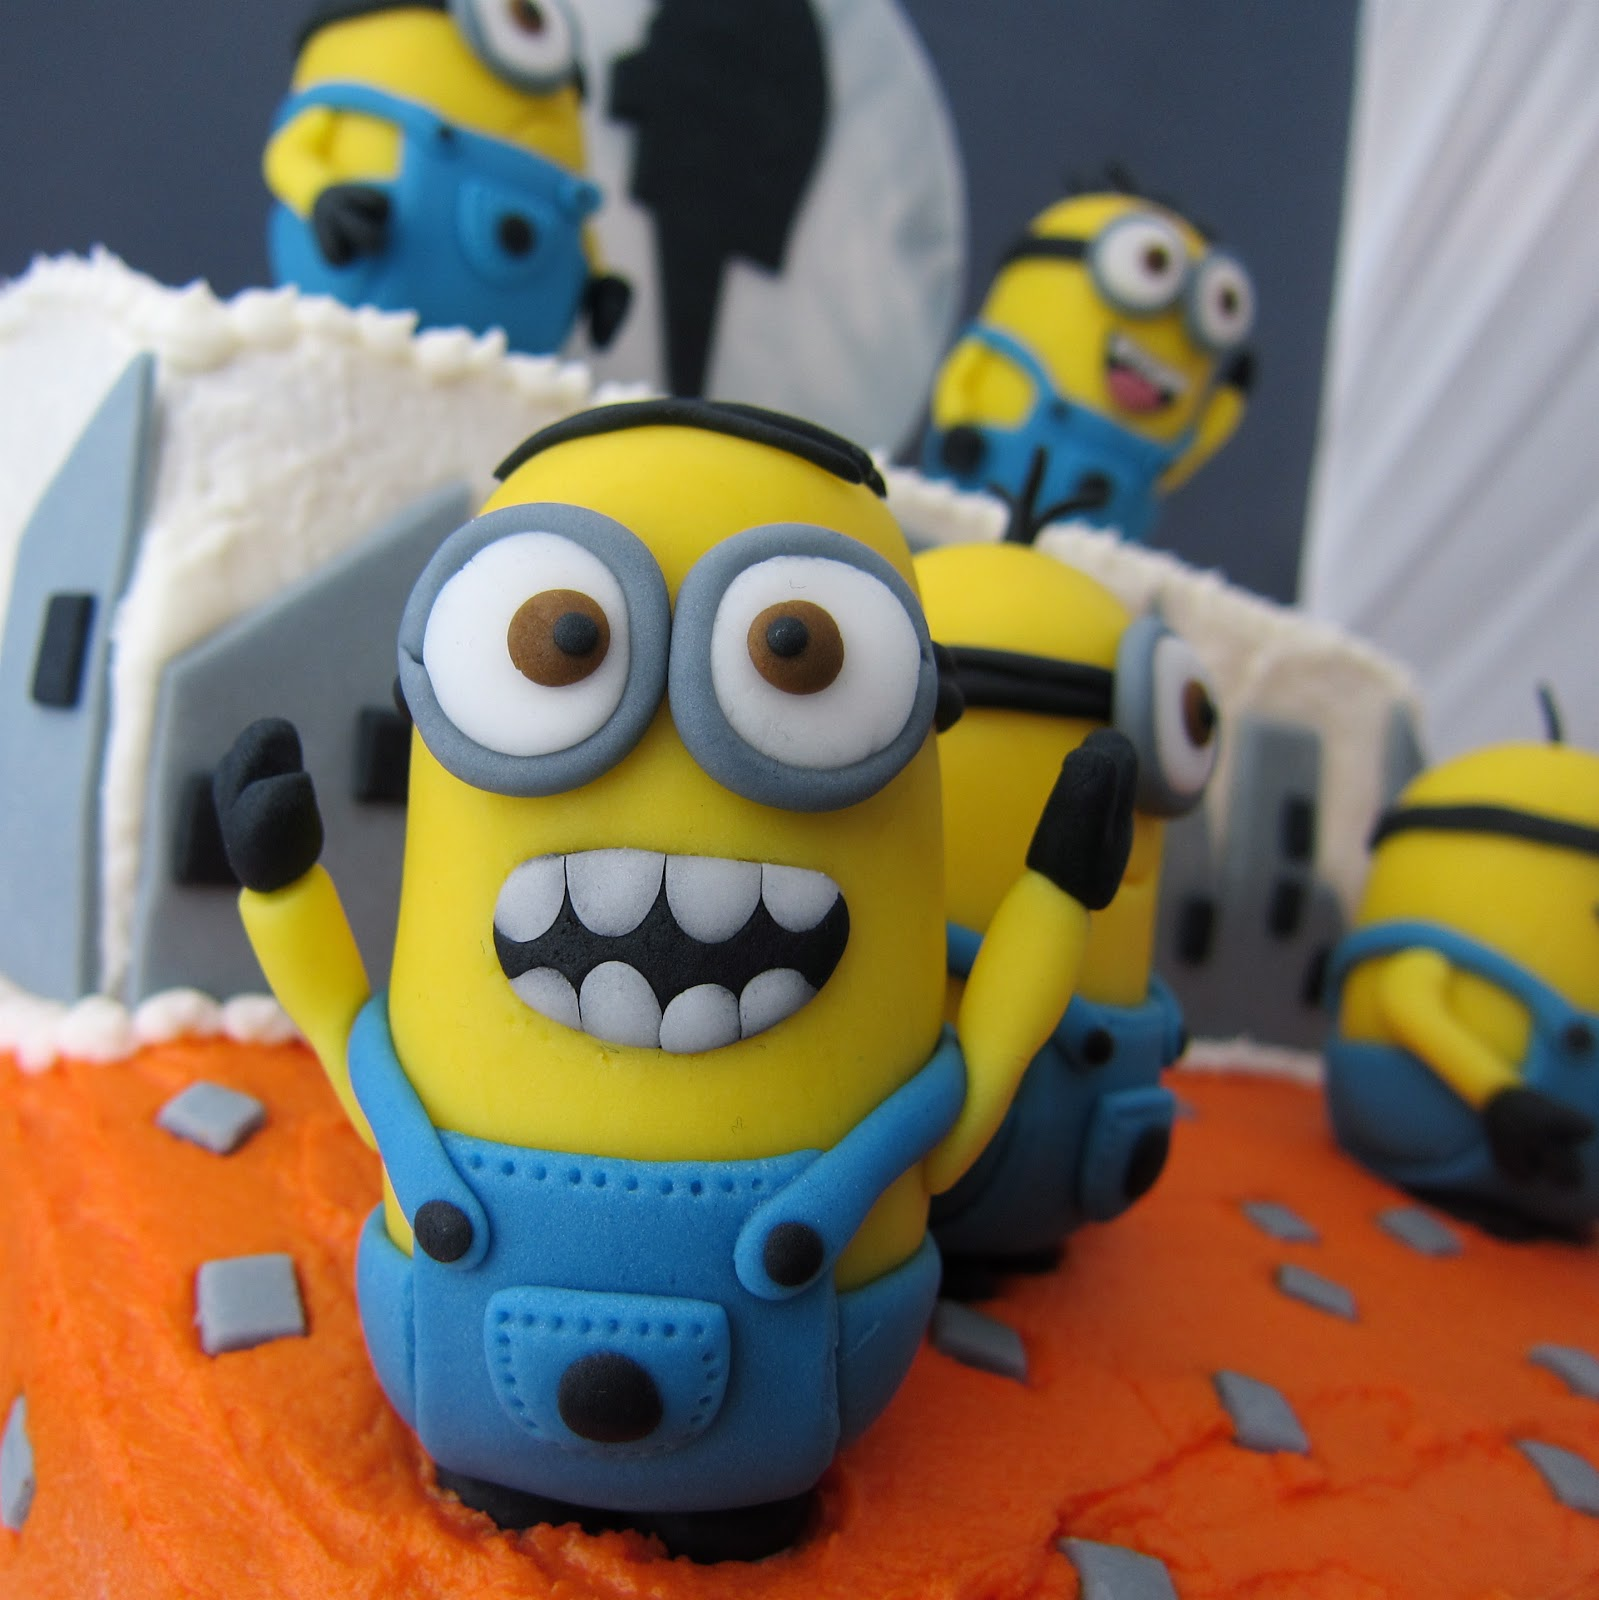 Clever wren despicable me minion cake - Cake decorations minions ...